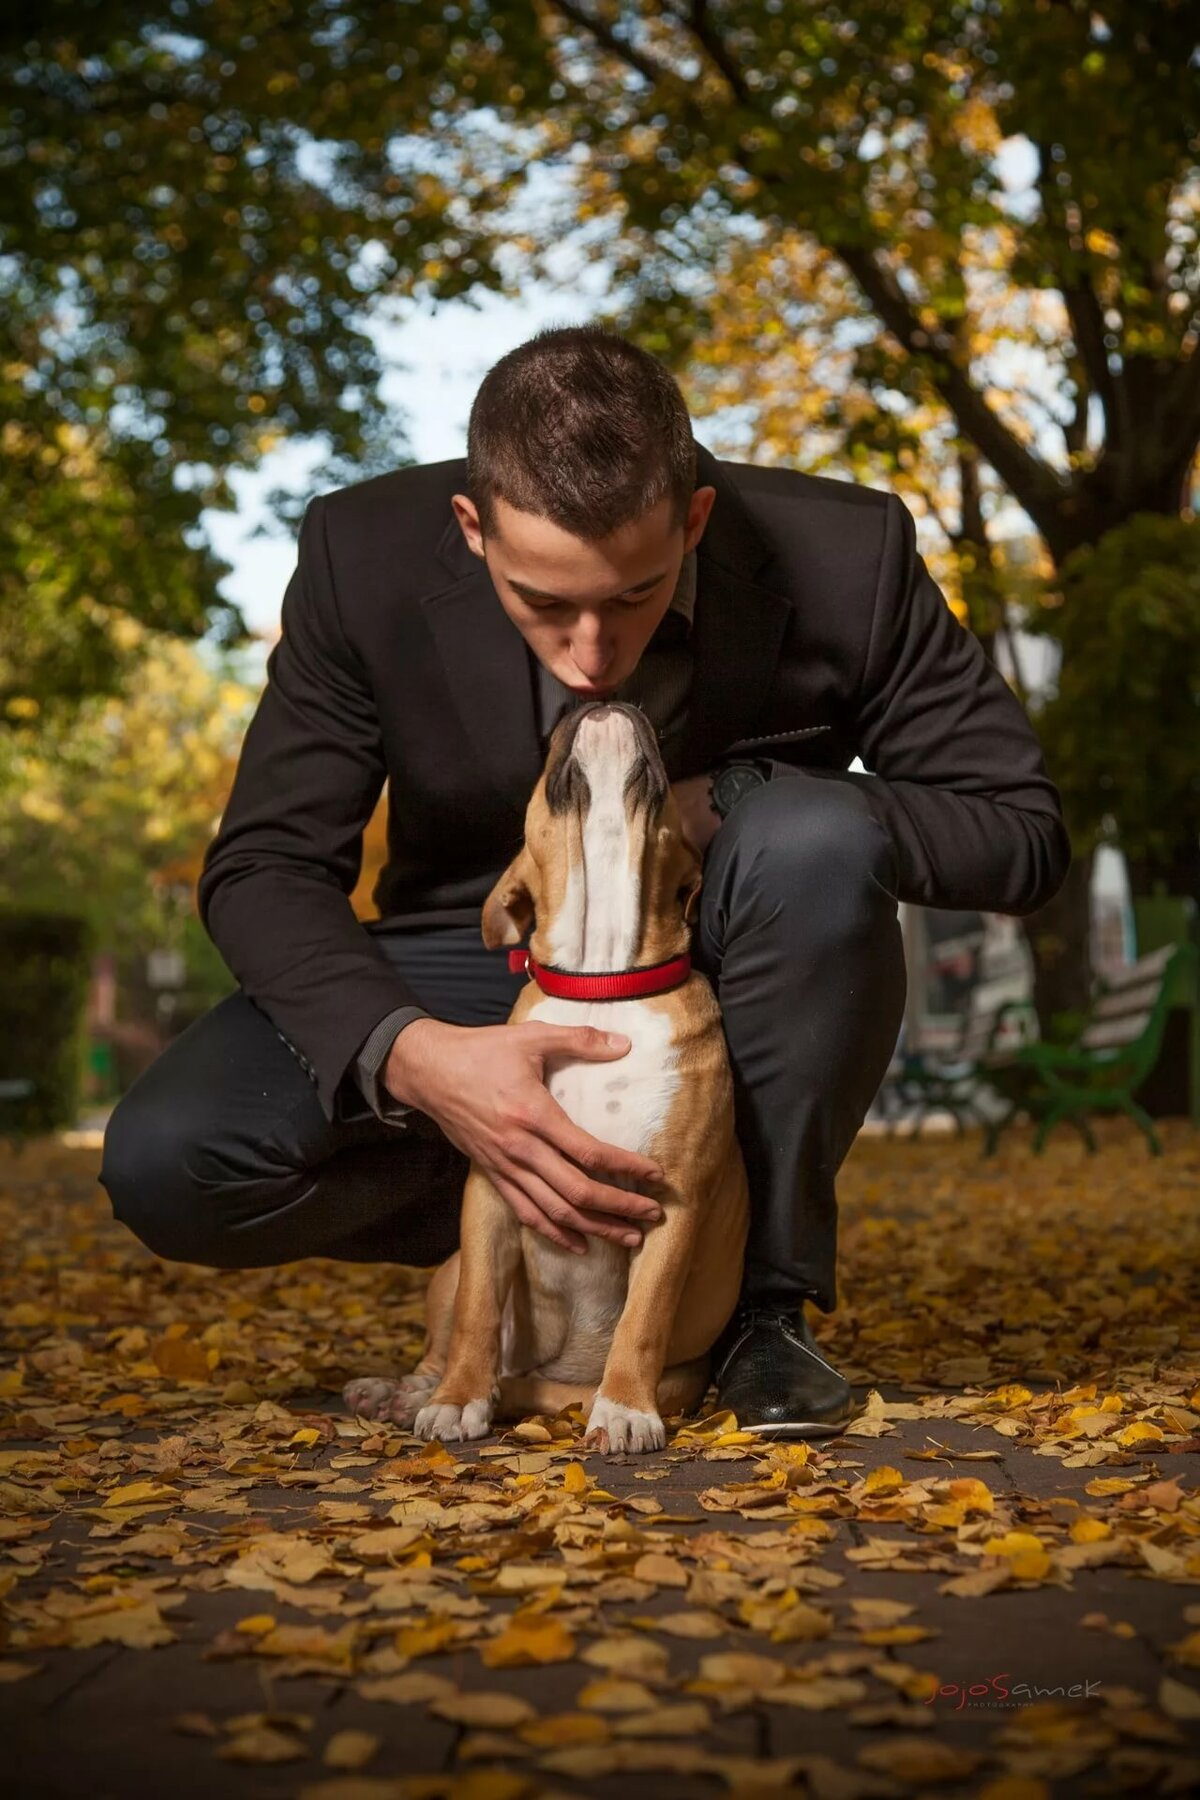 Картинка человека с собаками